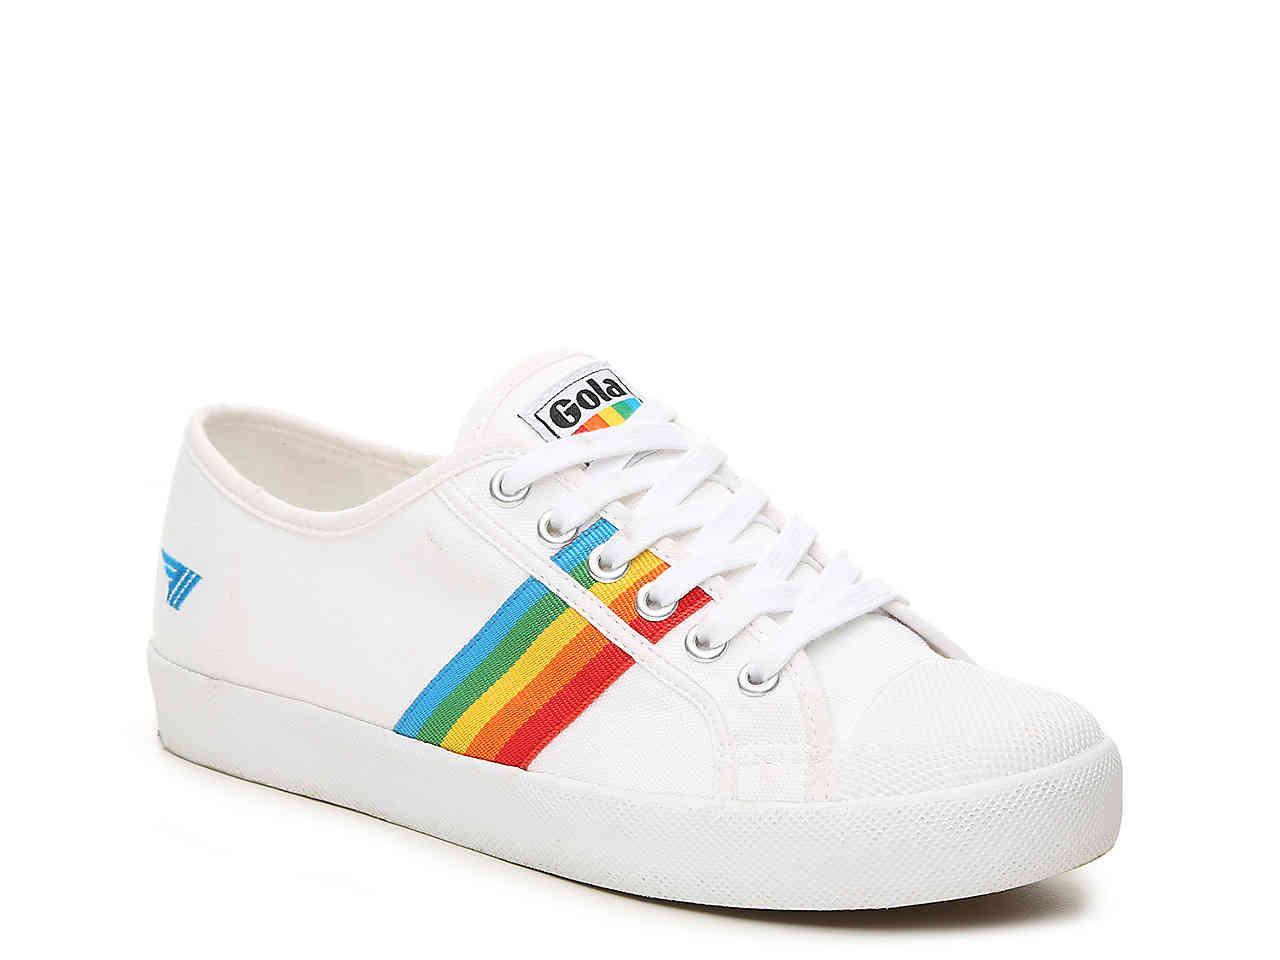 Lyst Gola Coaster Optic Sneaker in Weiß Save 41.81818181818182% 41.81818181818182% Save c5ac8c